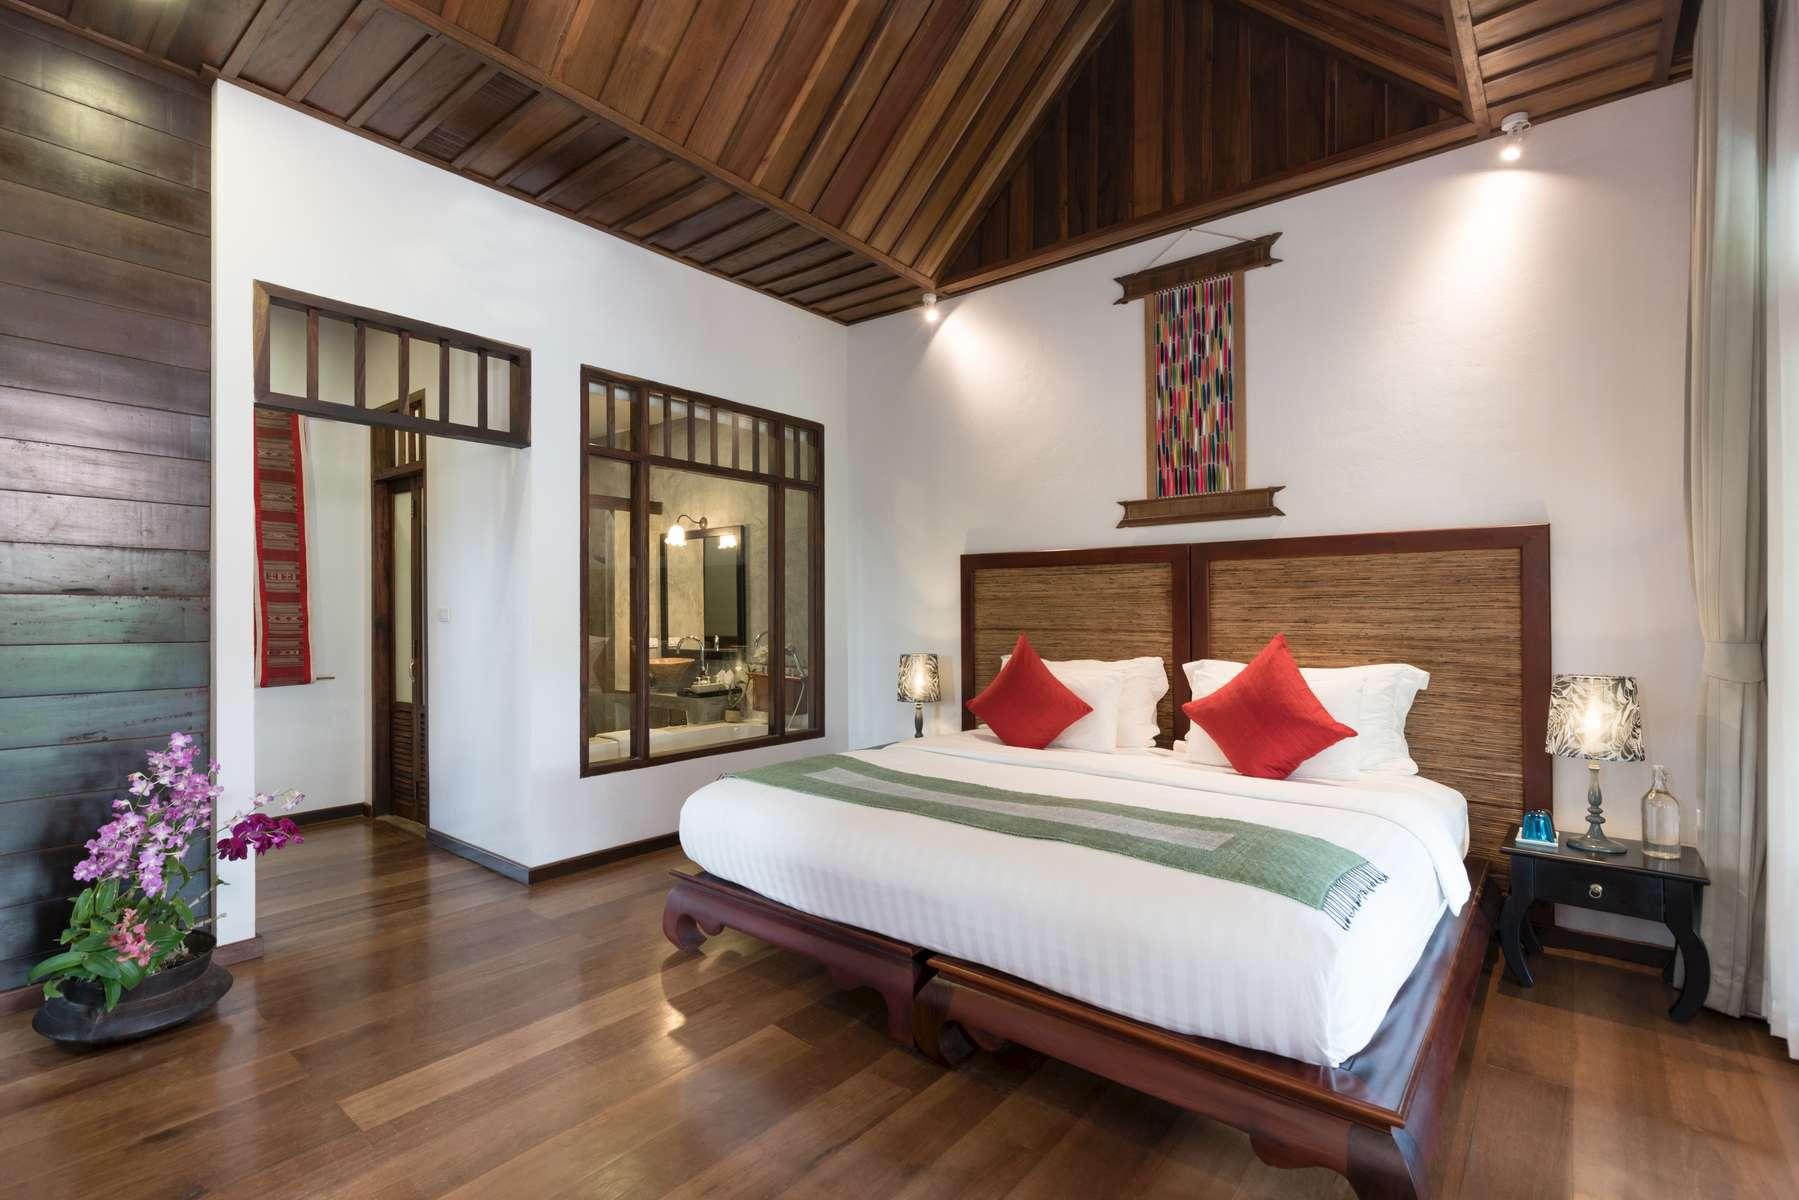 Maison_DaLaBua_Hotel_Luang_Prabang_Laos_Photo-by-Cyril-Eberle-DSC08793-Edit